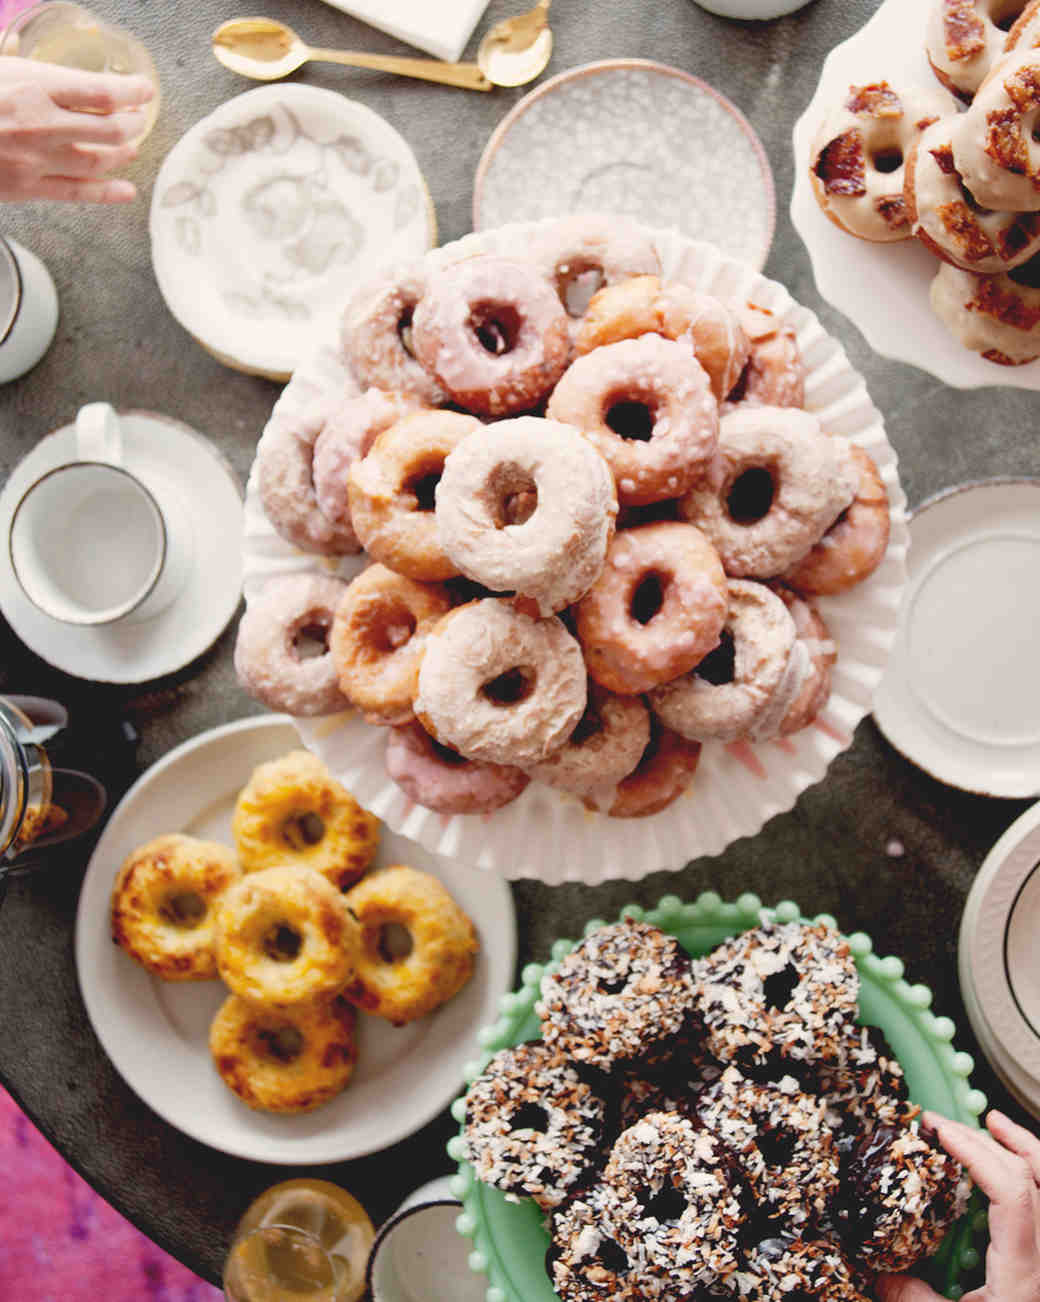 claire-thomas-bridal-shower-tea-table-food-top-0814.jpg